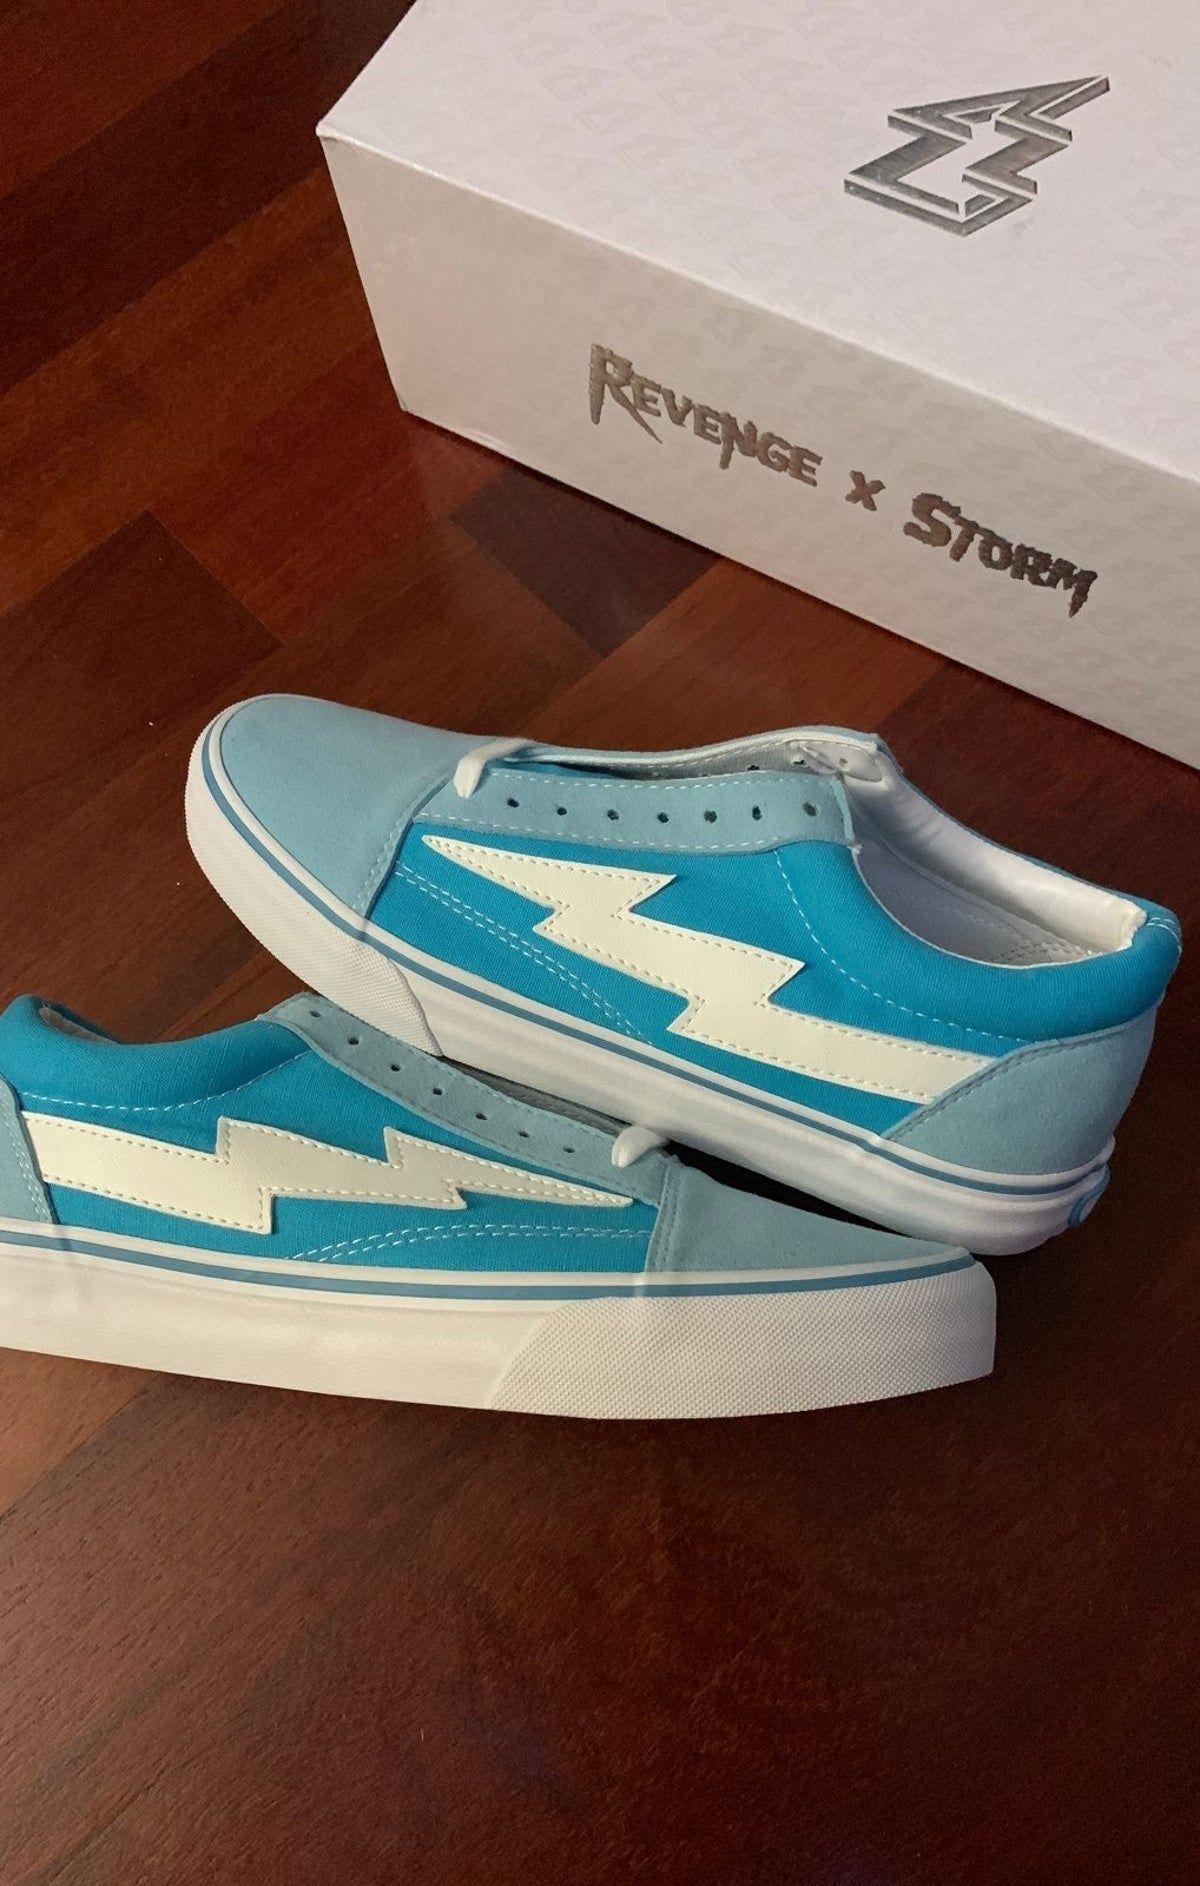 Revenge X Storm Bolt Blue In 2020 Hype Shoes Aesthetic Shoes Fresh Shoes